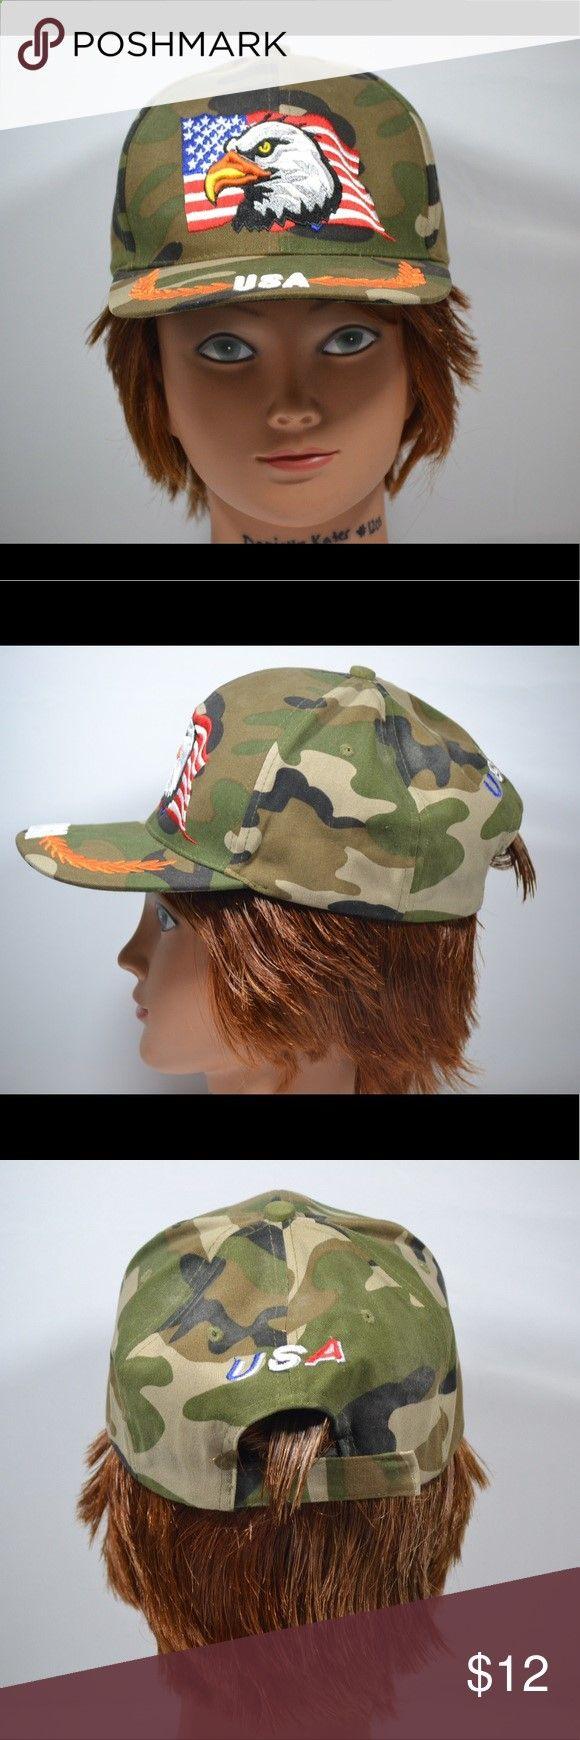 VTG USA Camo Bald Eagle Velcro Strapback Cap VTG USA Camo Bald Eagle Velcro Strapback Cap Accessories Hats